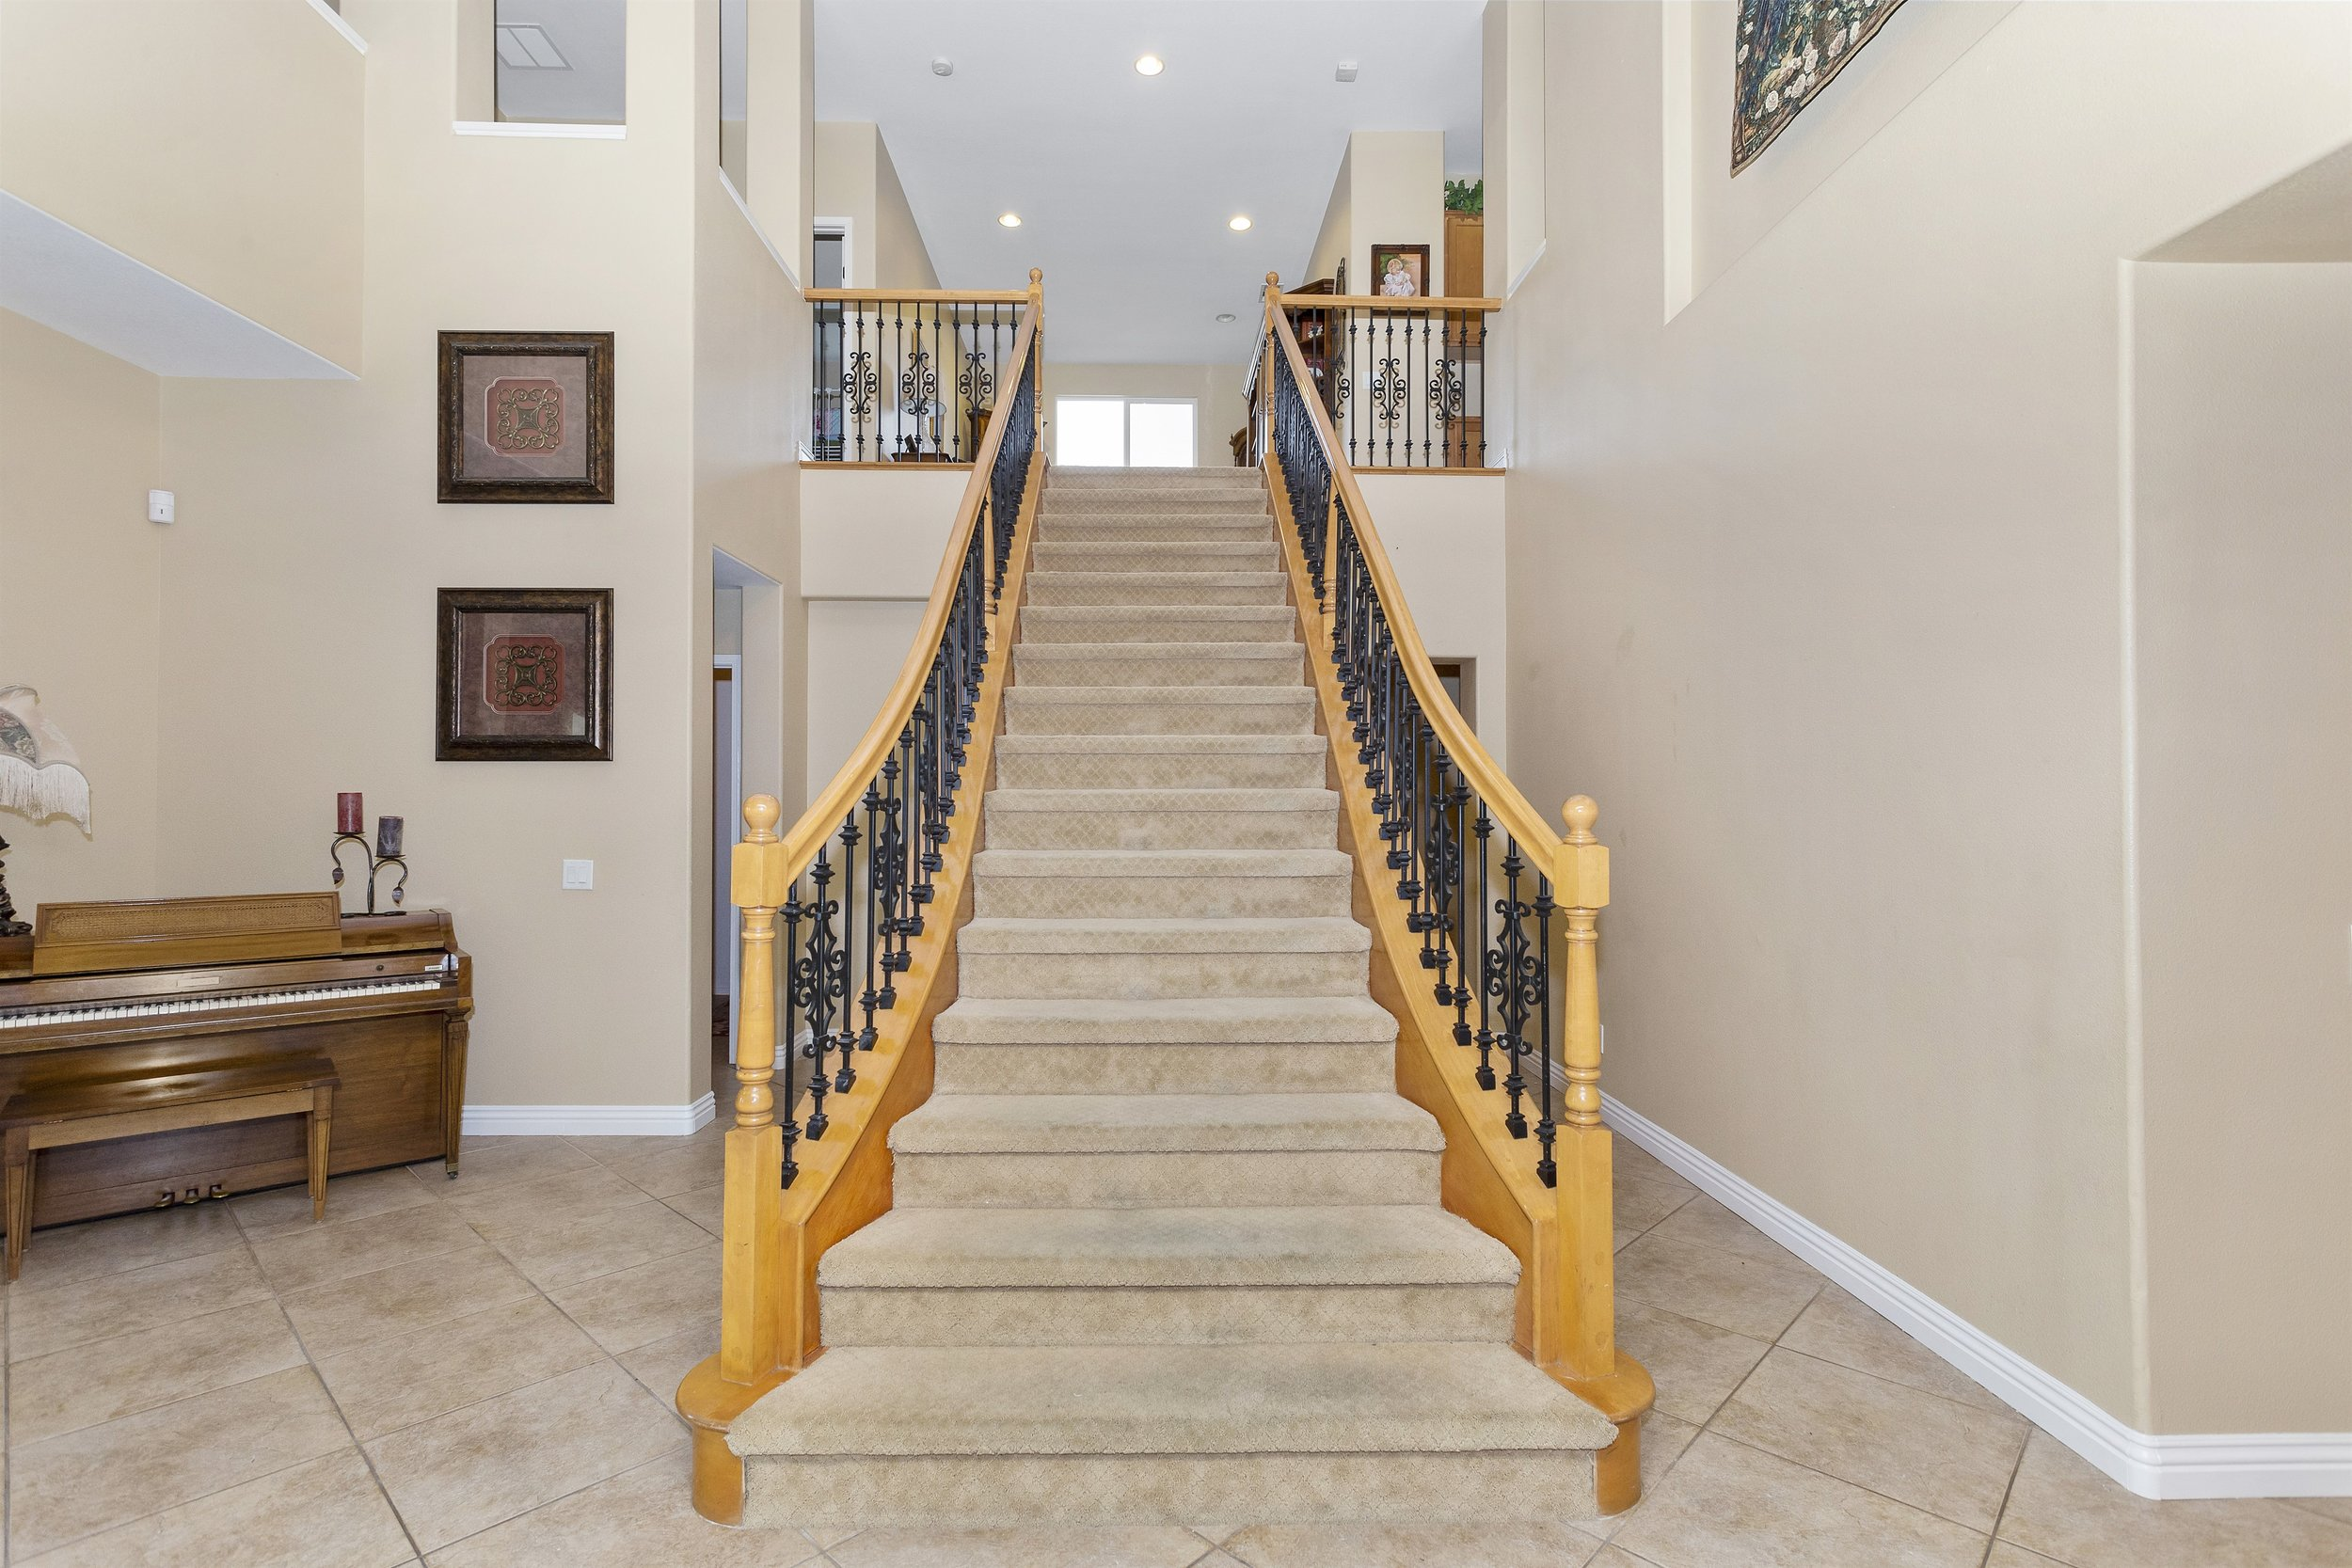 027_Staircase.jpg